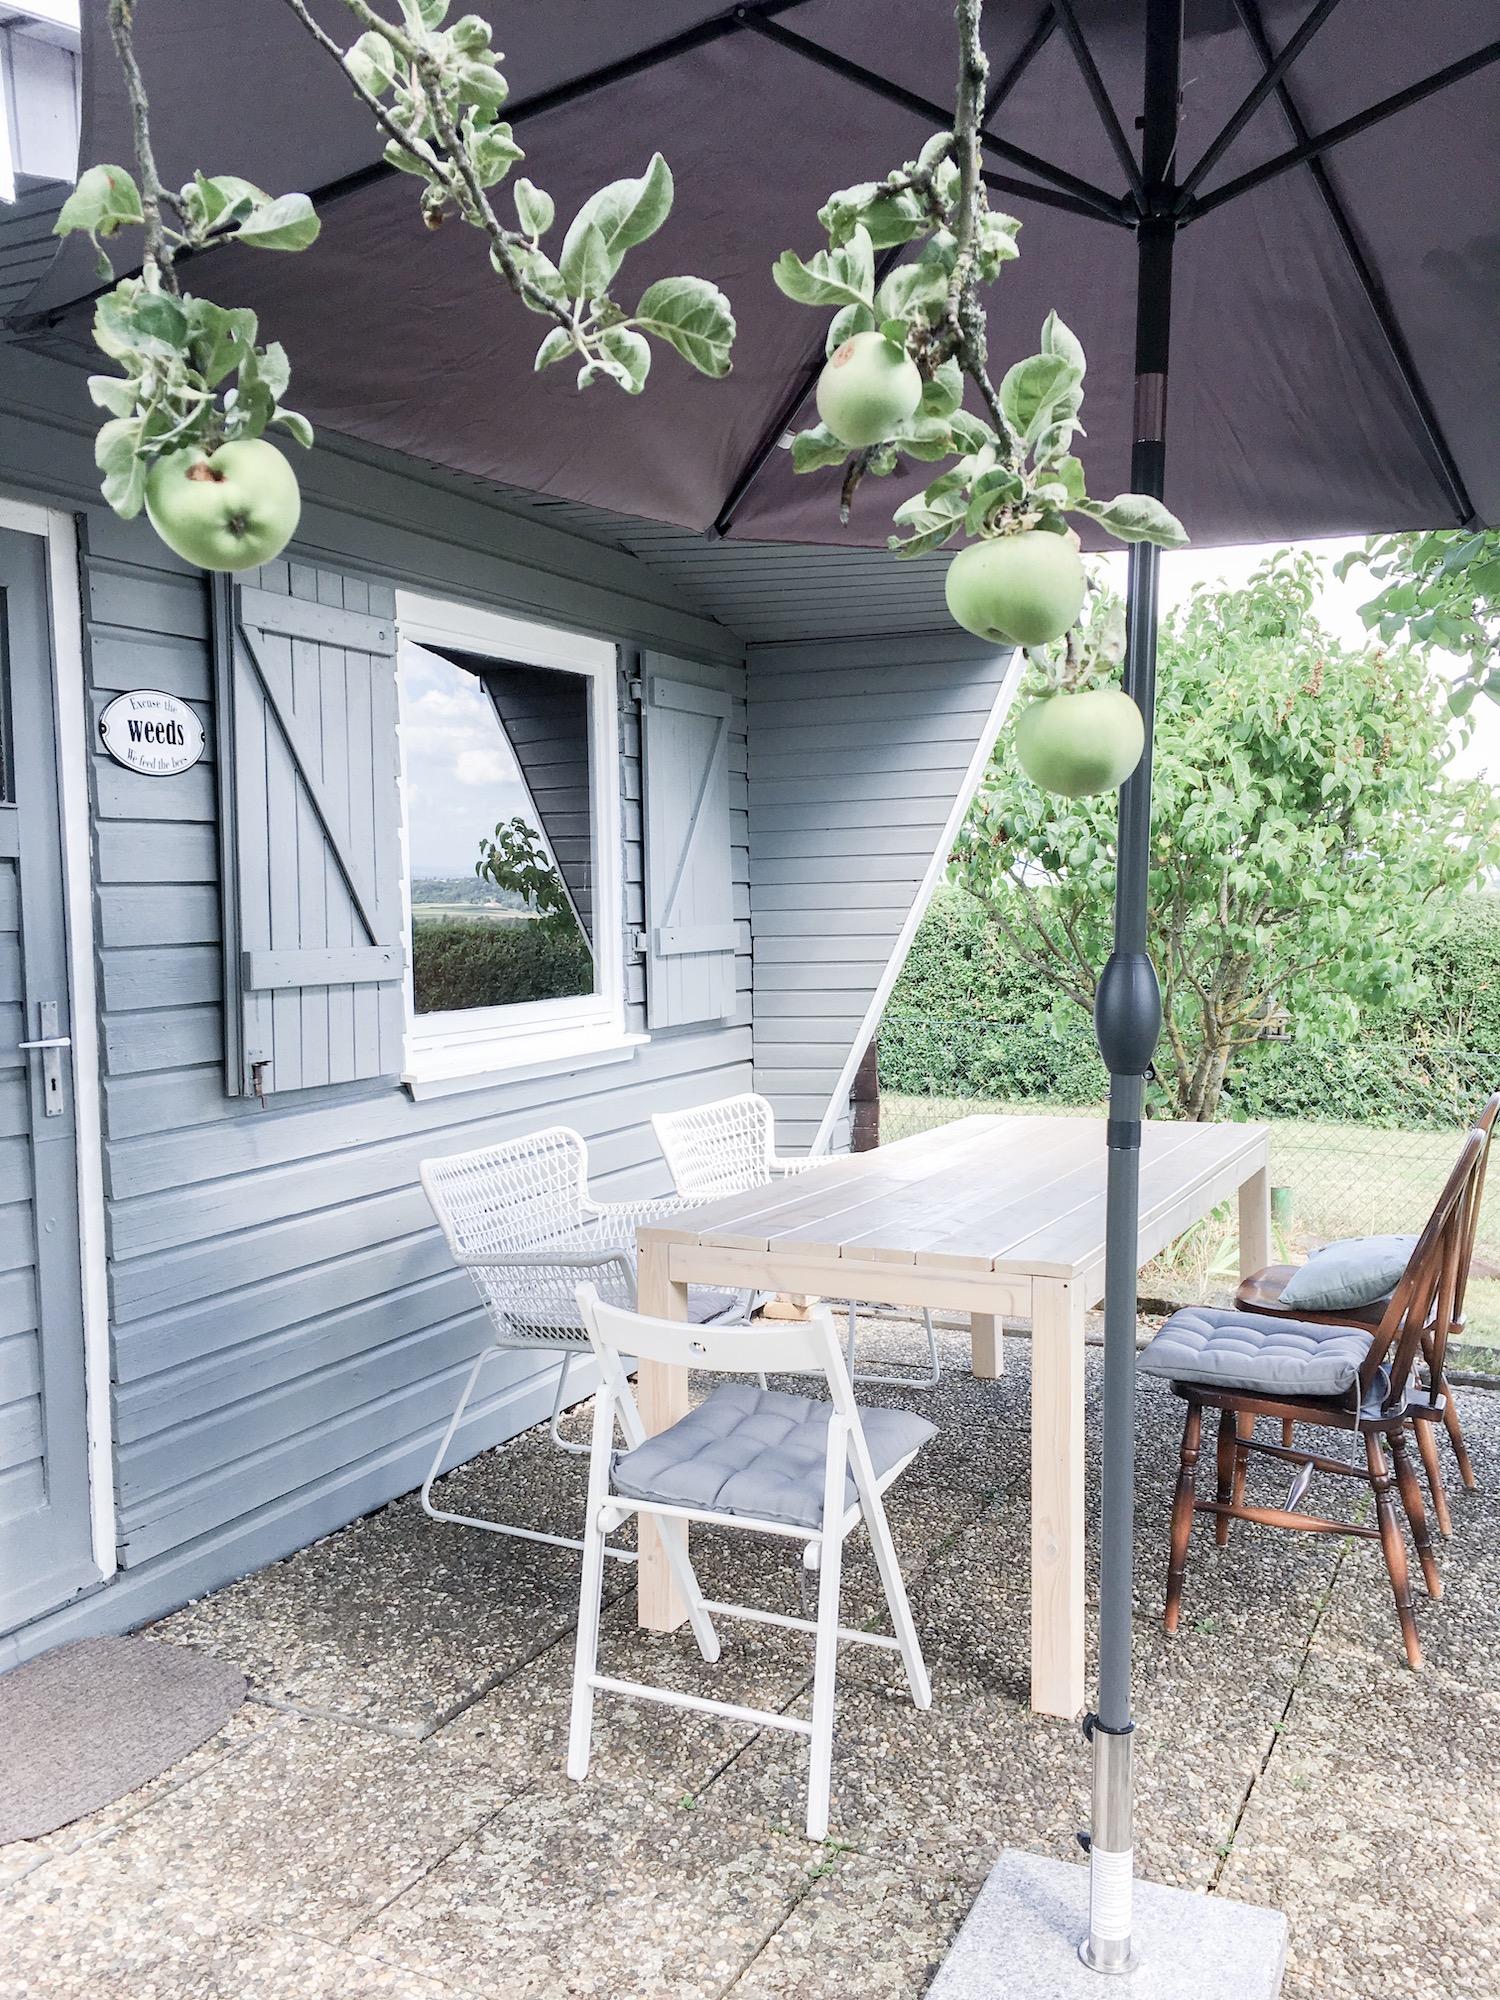 Gartenlaube Emaille Schild Ramsign Foto-Lieblings Blog